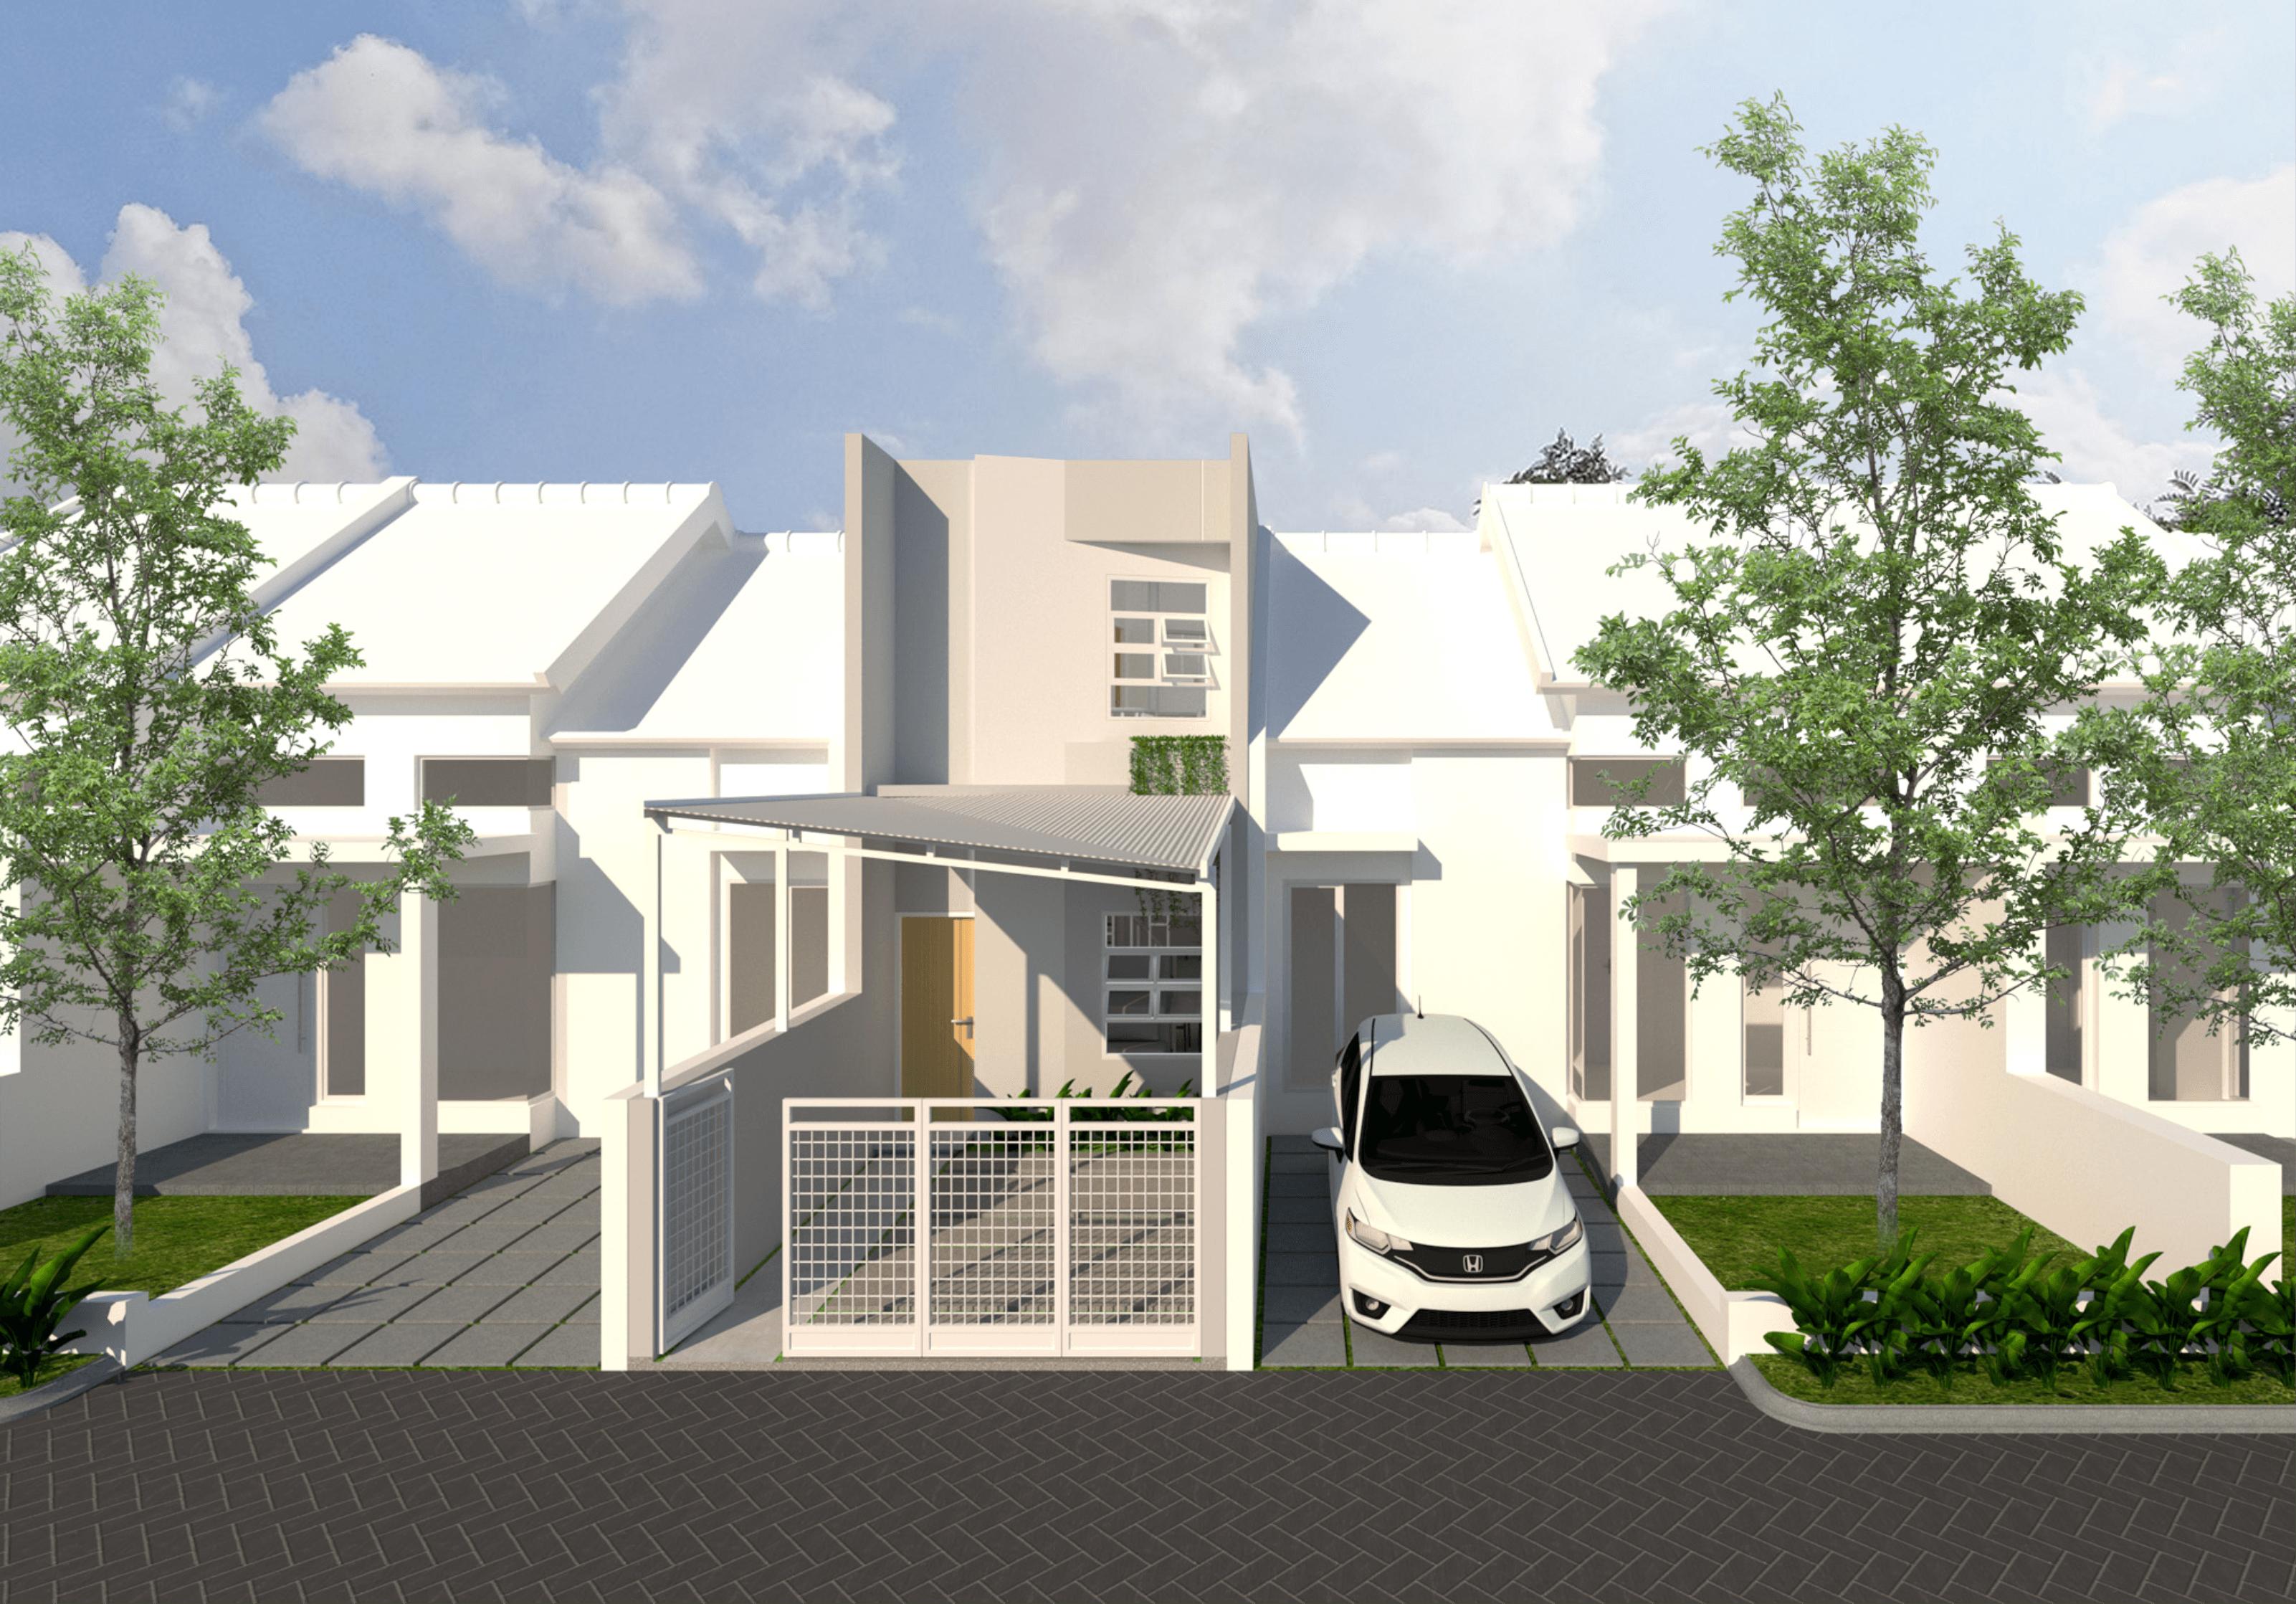 Inawa Arsitek Compact House Makassar, Kota Makassar, Sulawesi Selatan, Indonesia Makassar, Kota Makassar, Sulawesi Selatan, Indonesia Inawa-Arsitek-Compact-House   112044